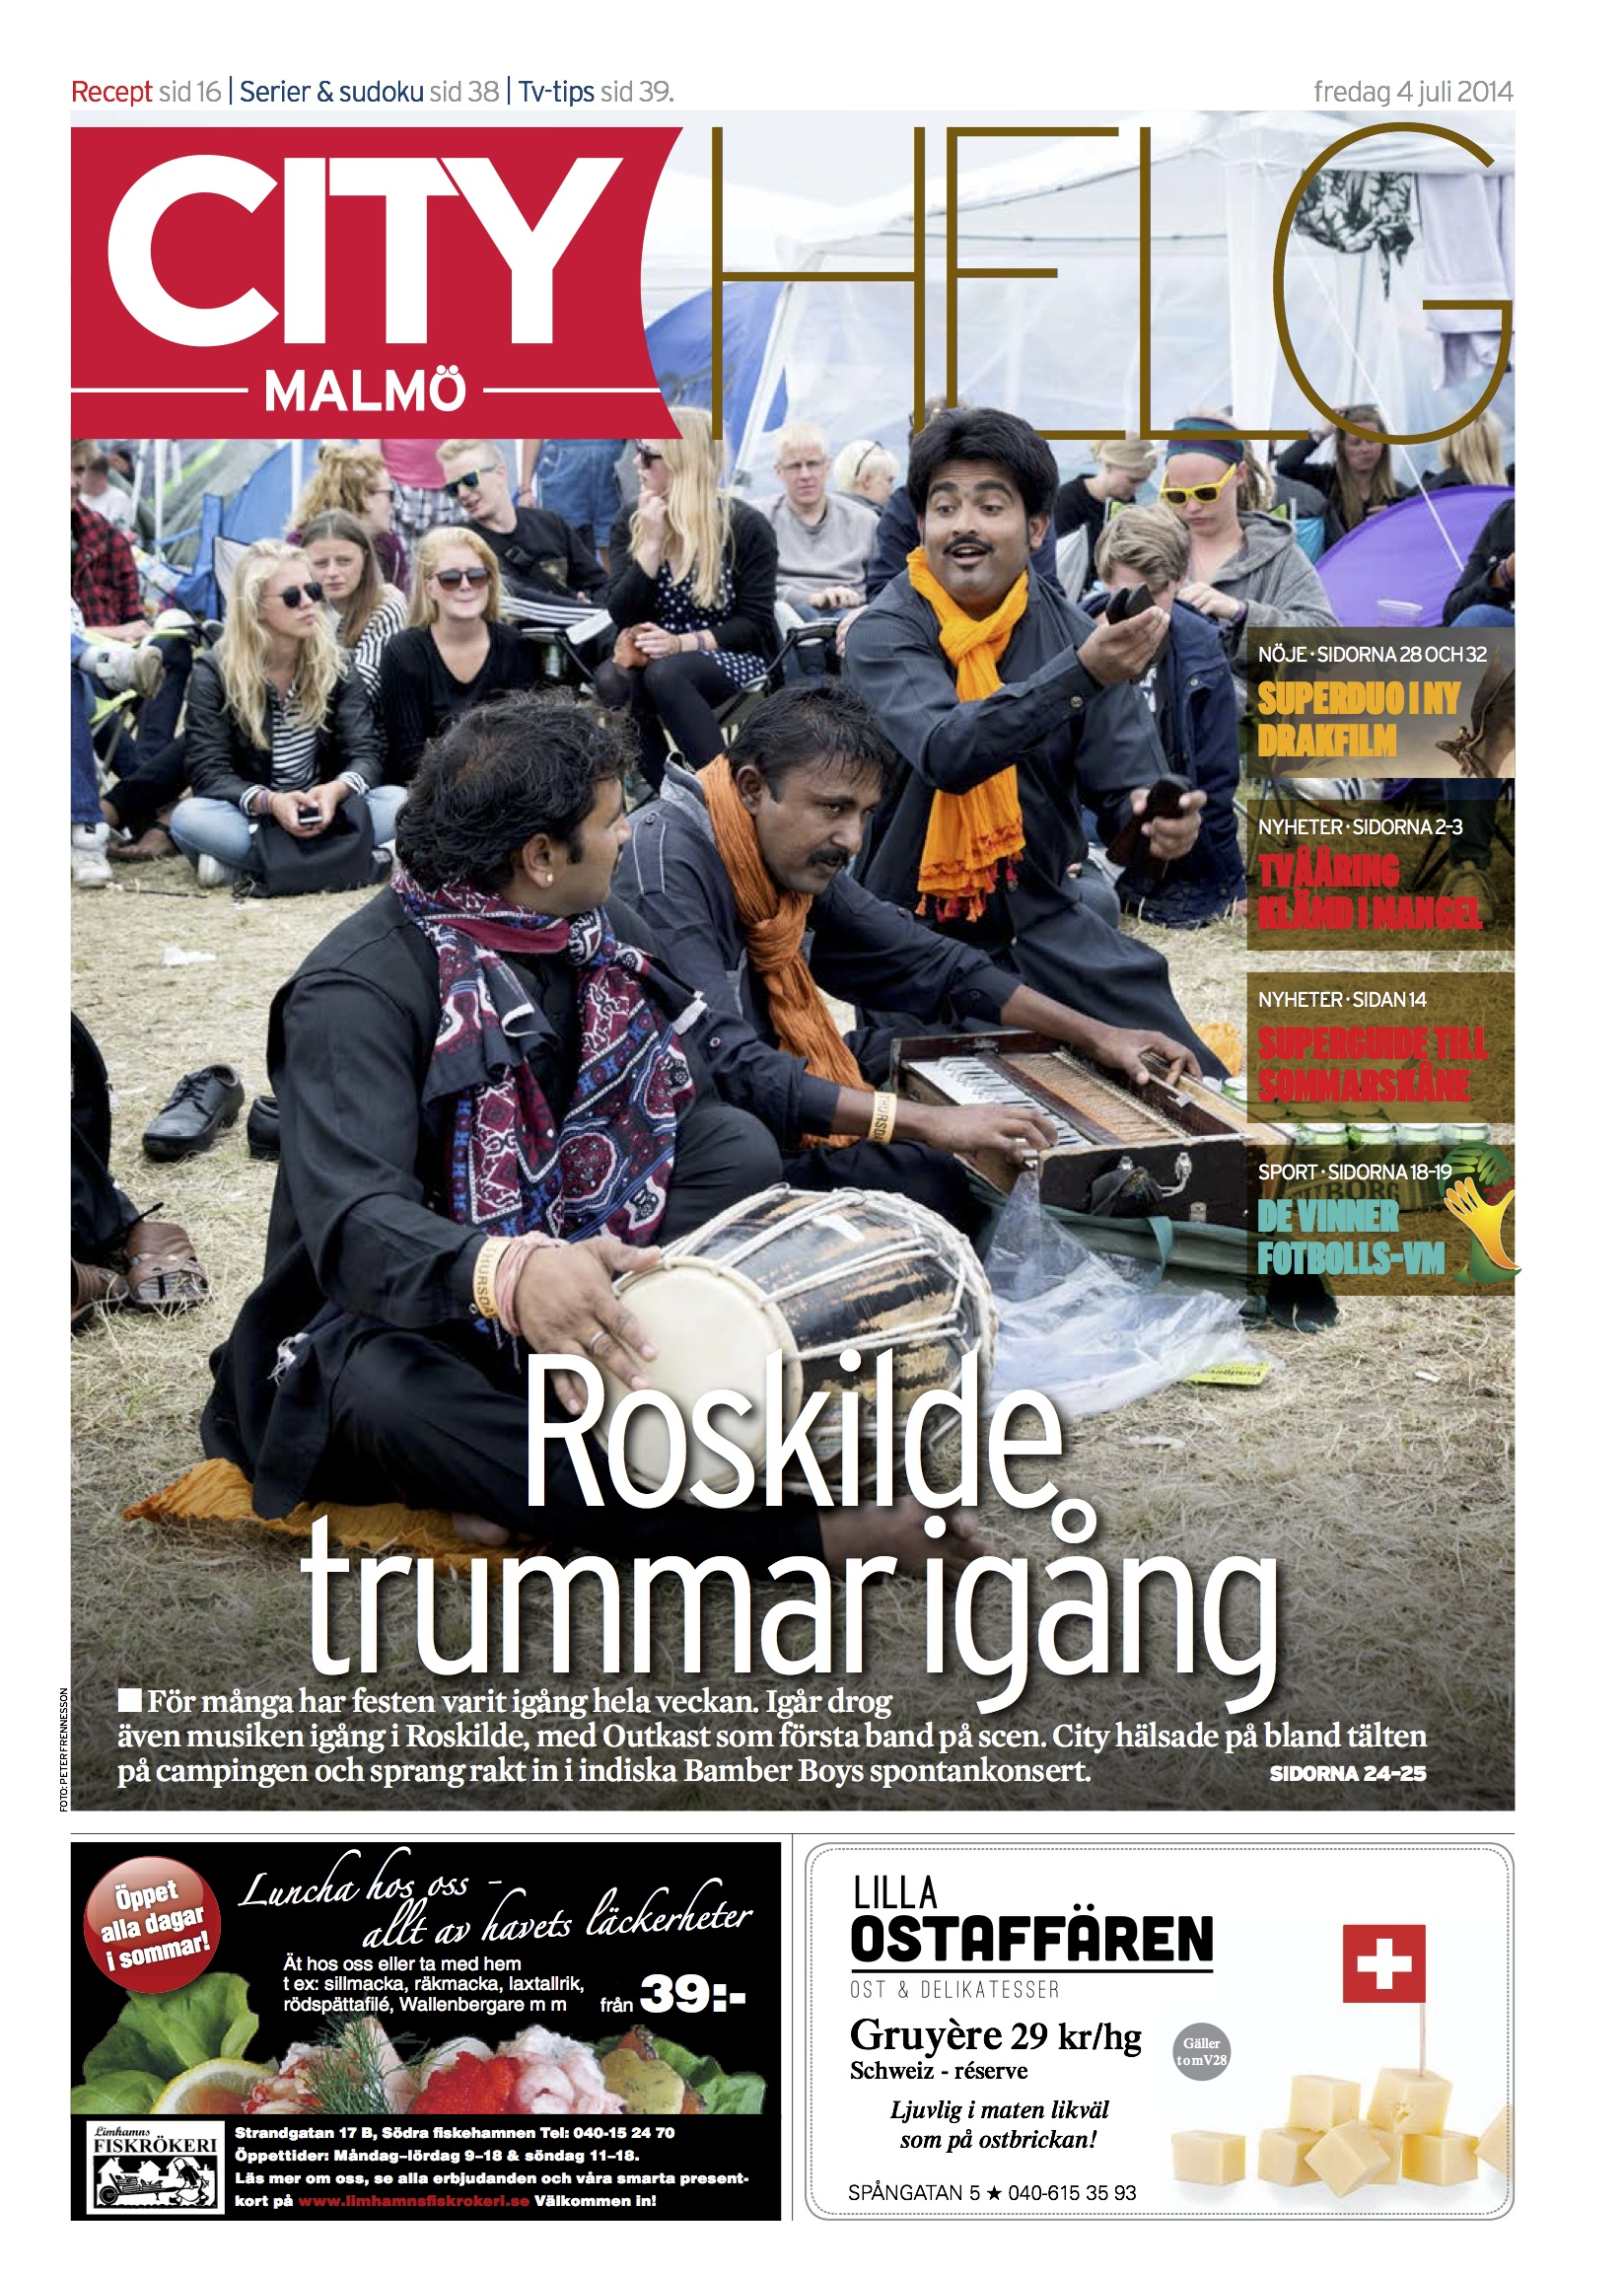 Tidningen-City-omslag-Roskilde-2014.jpg